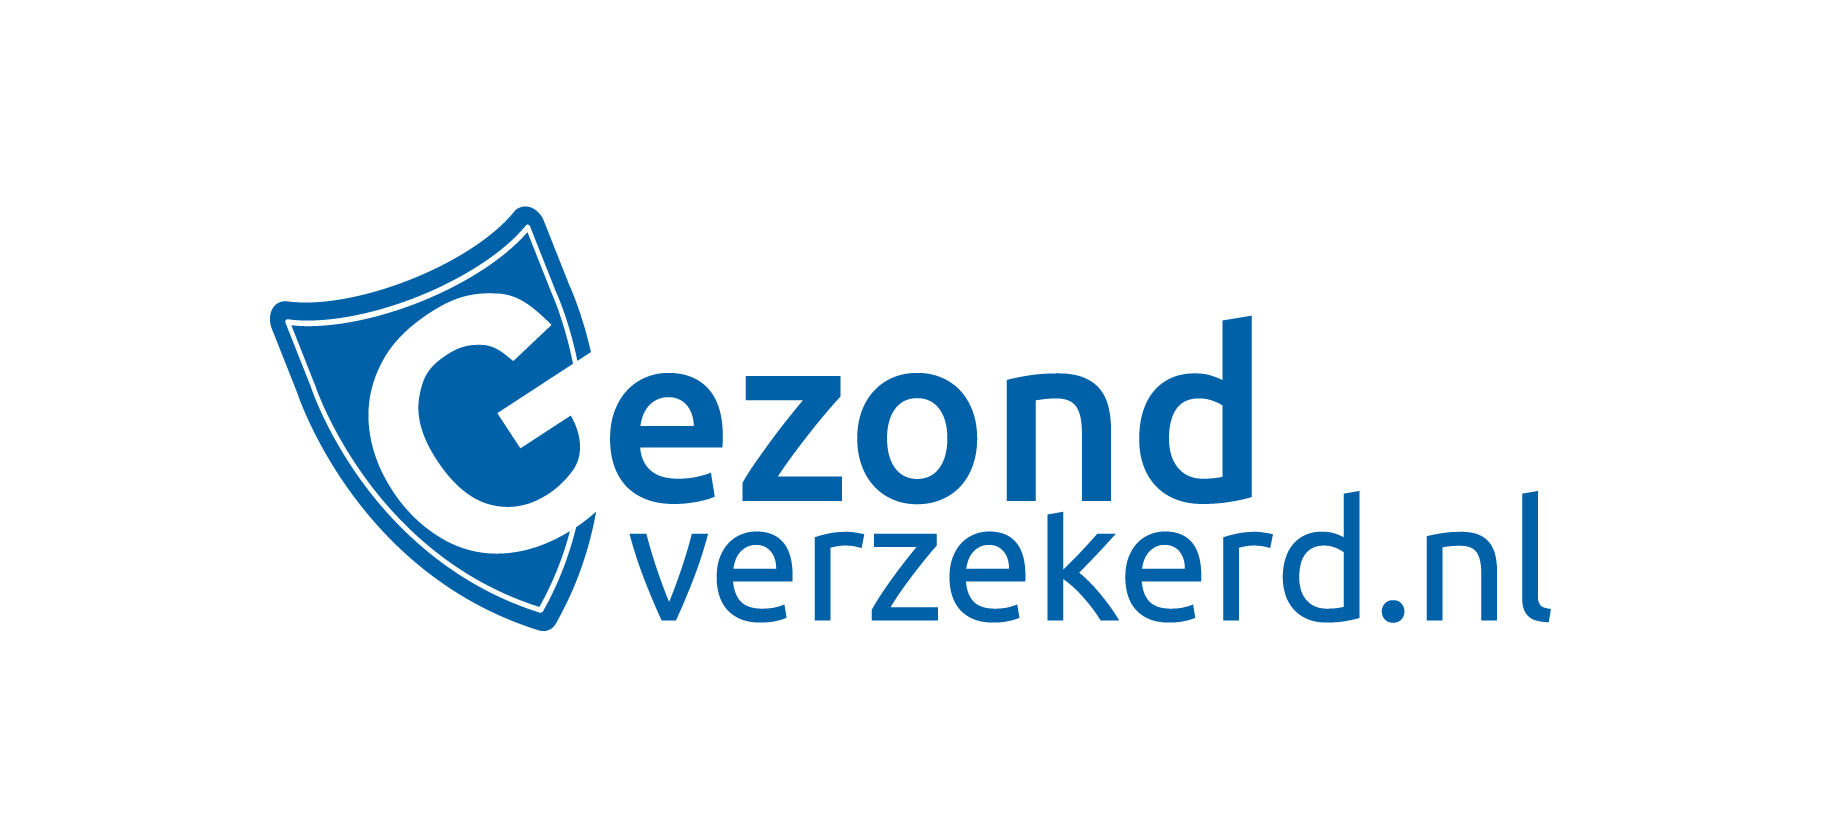 RGB gezondverzekerd logo blauw